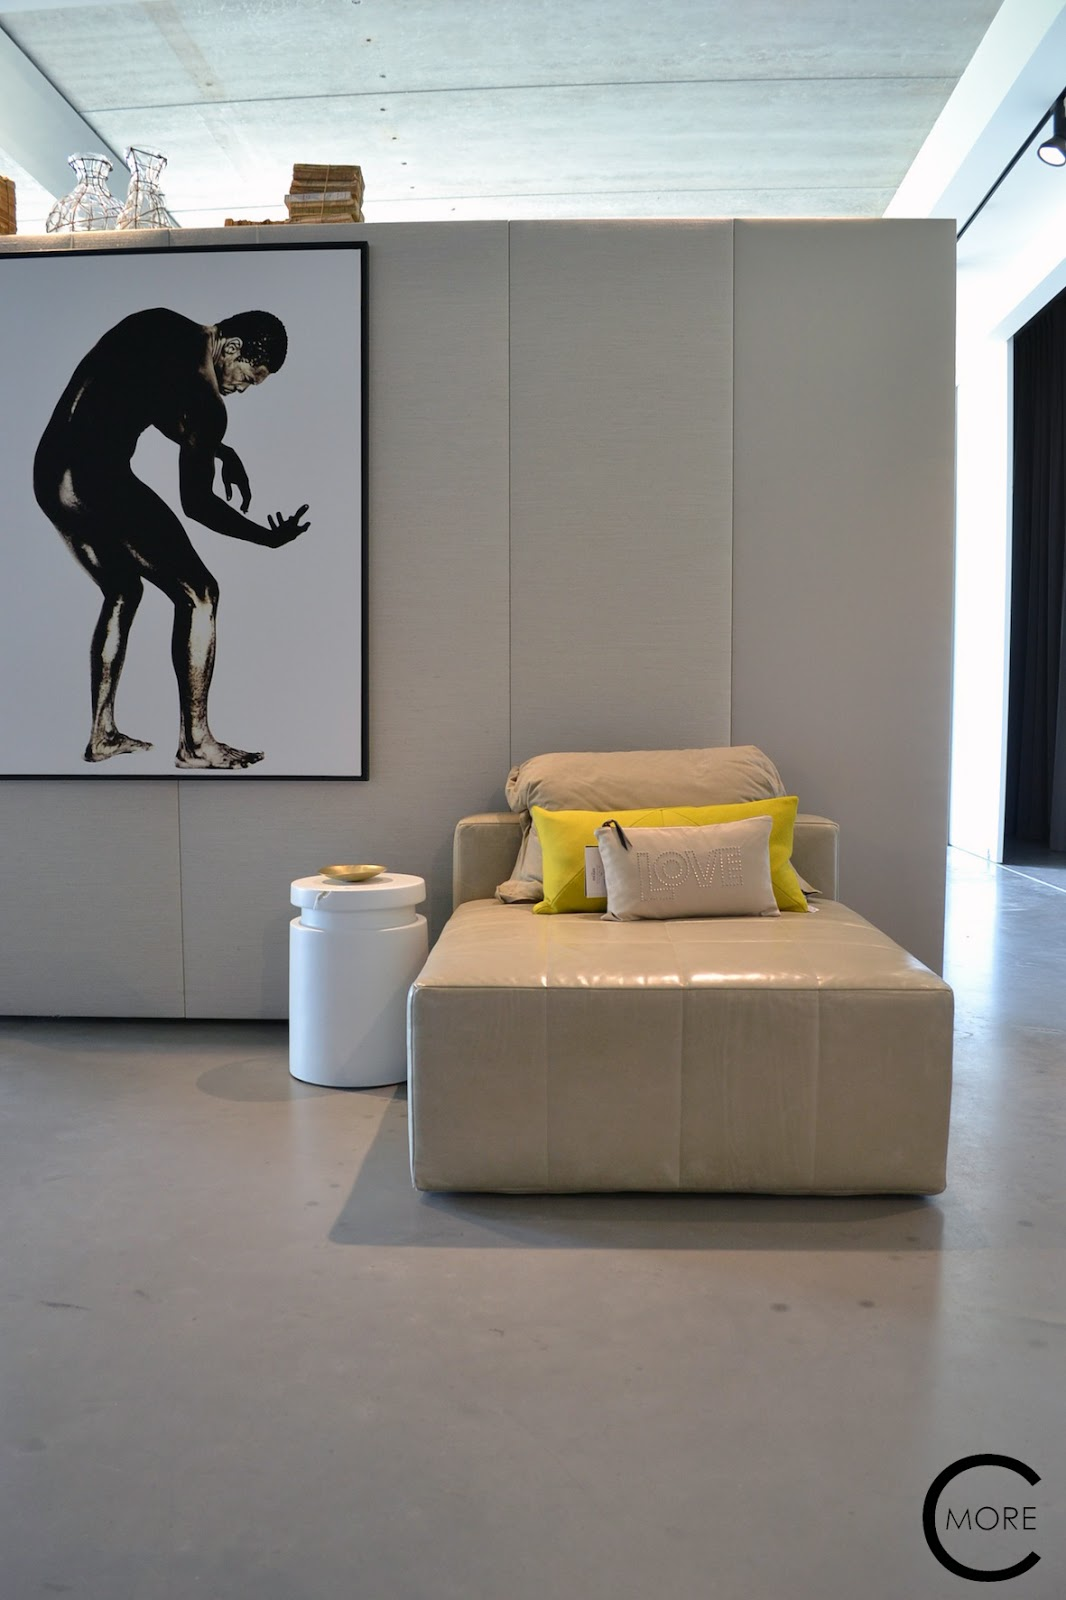 C more interieuradvies blog interior and design blog piet for Interieur bloggers